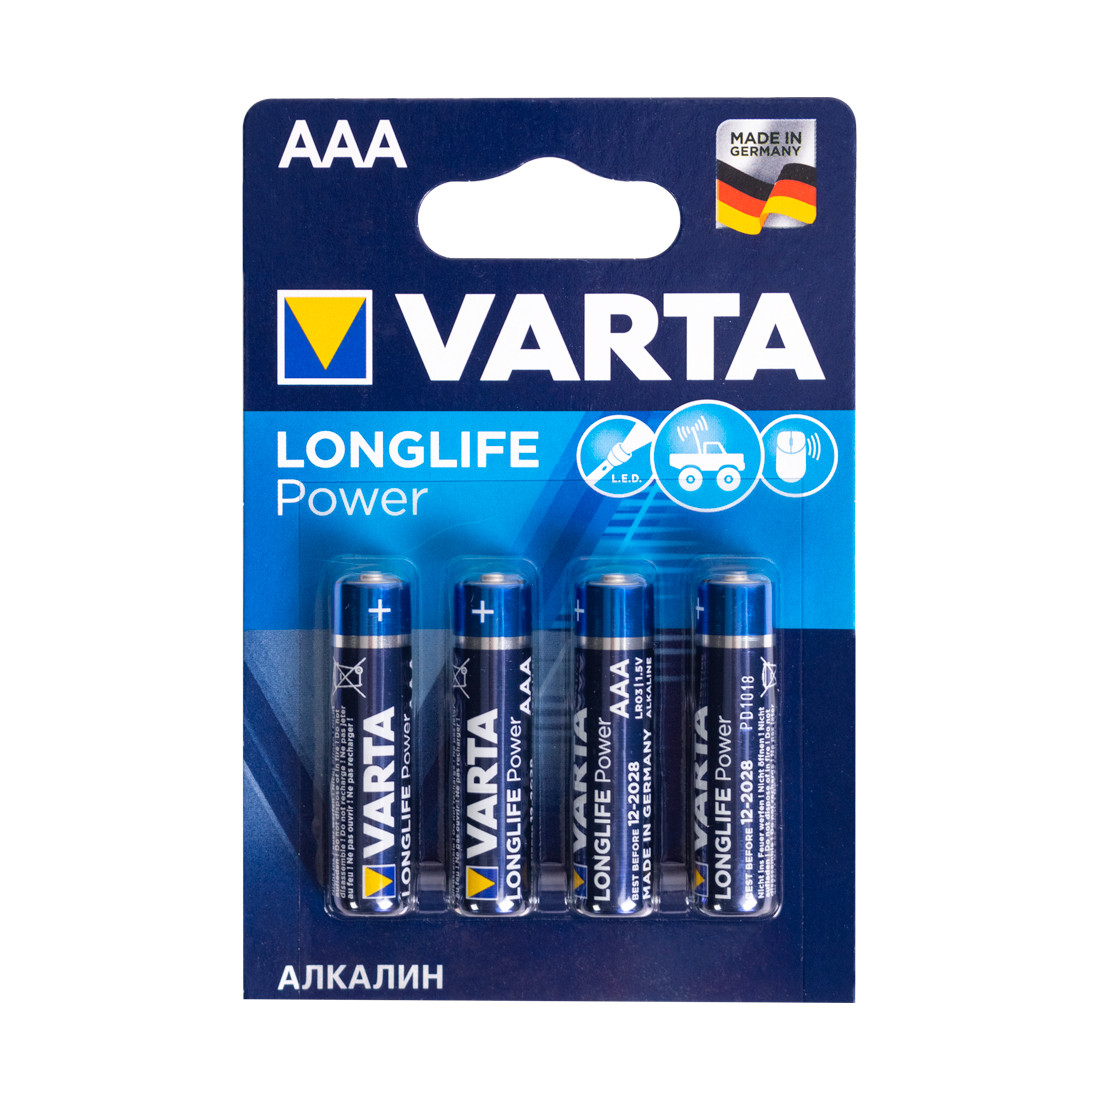 Батарейка, VARTA, LR03 Longlife Power Micro, AAA, 1.5 V, 4 шт., Блистер